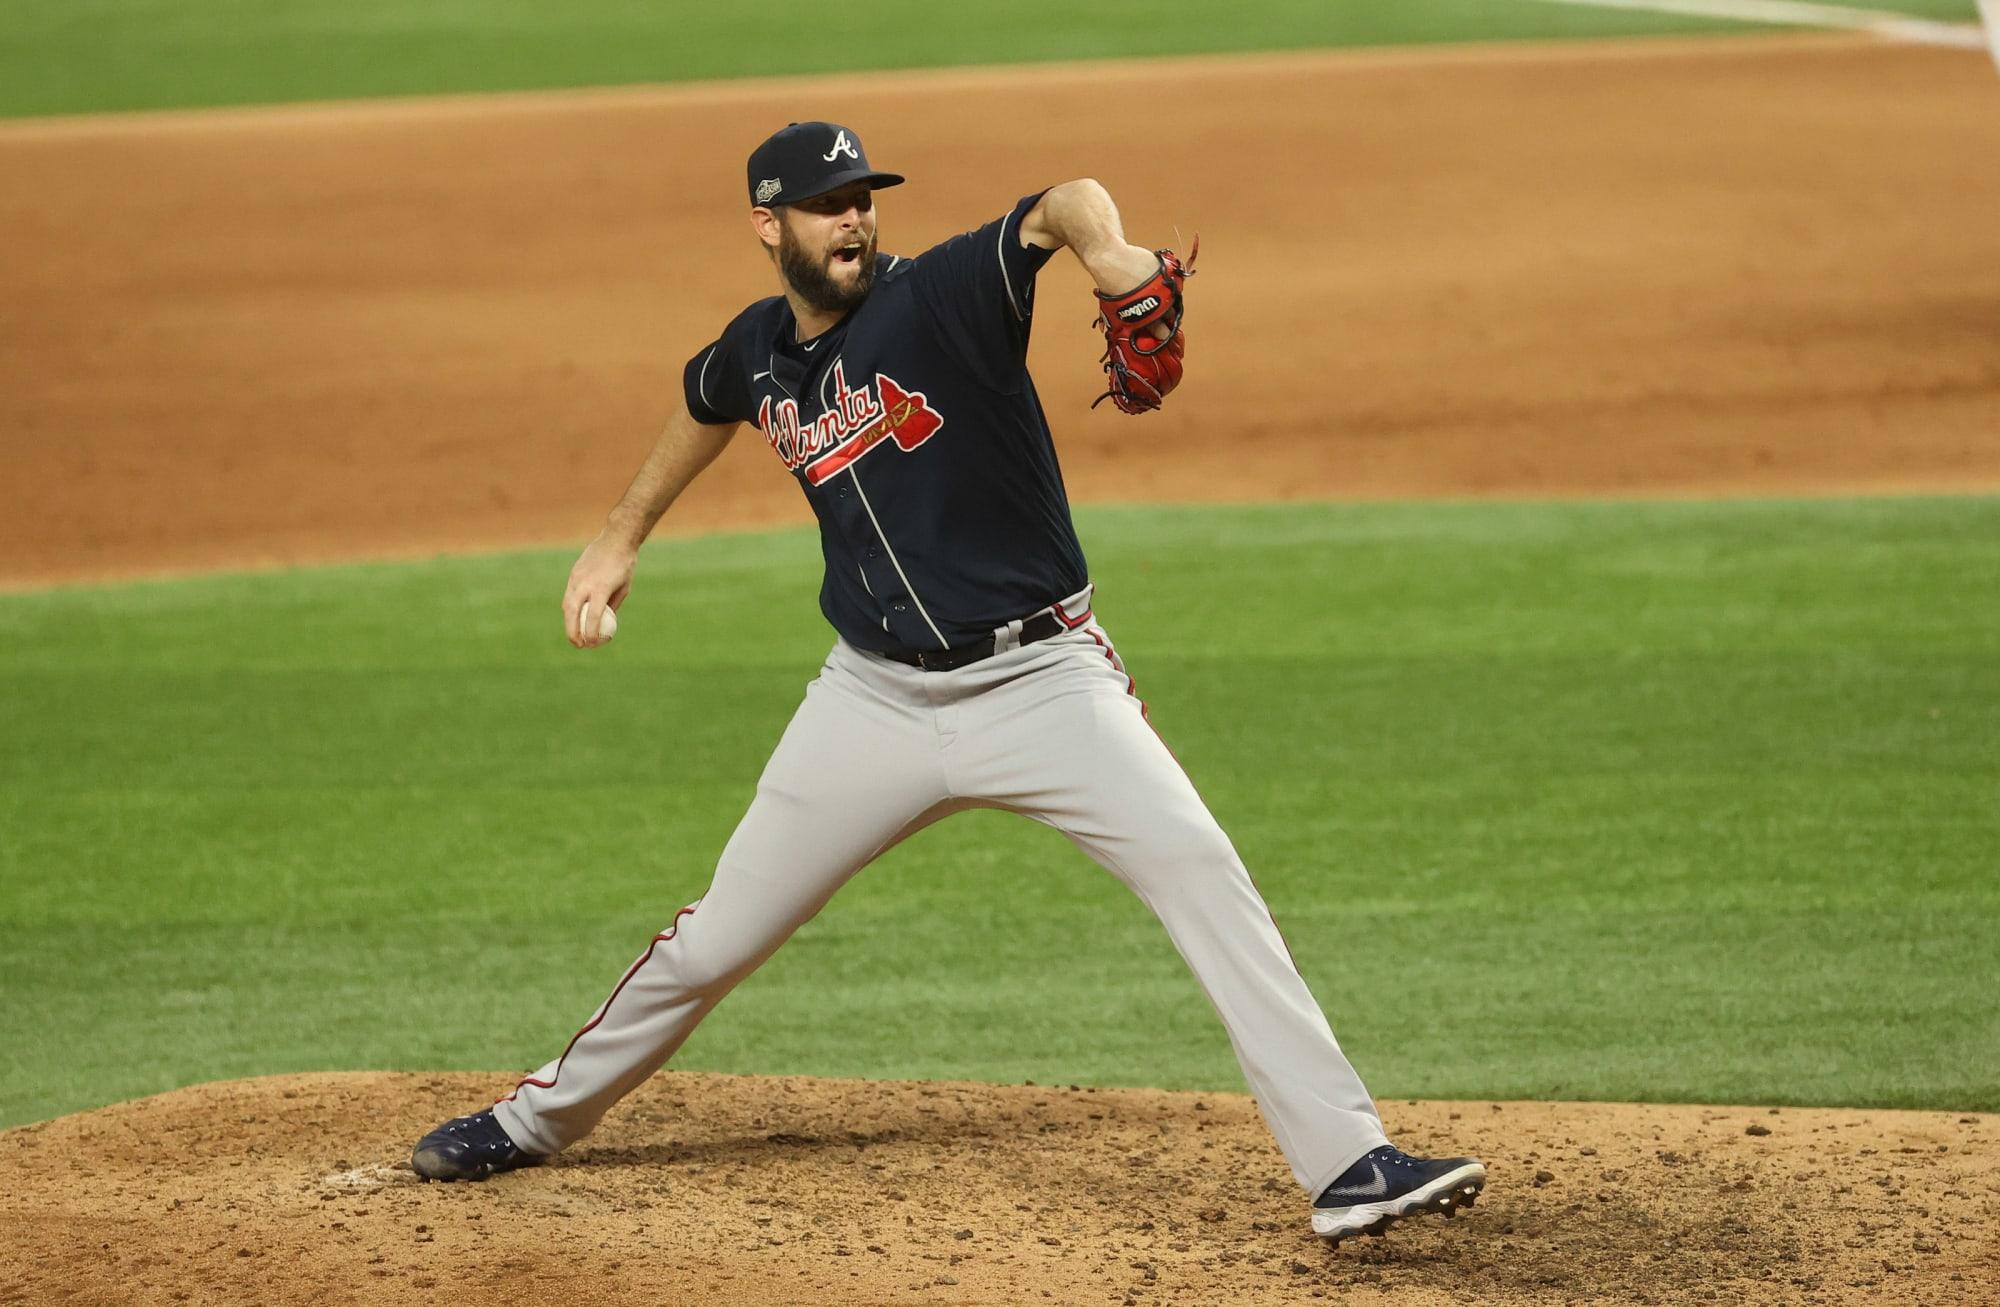 Atlanta Braves bullpen use follows a league wide trend